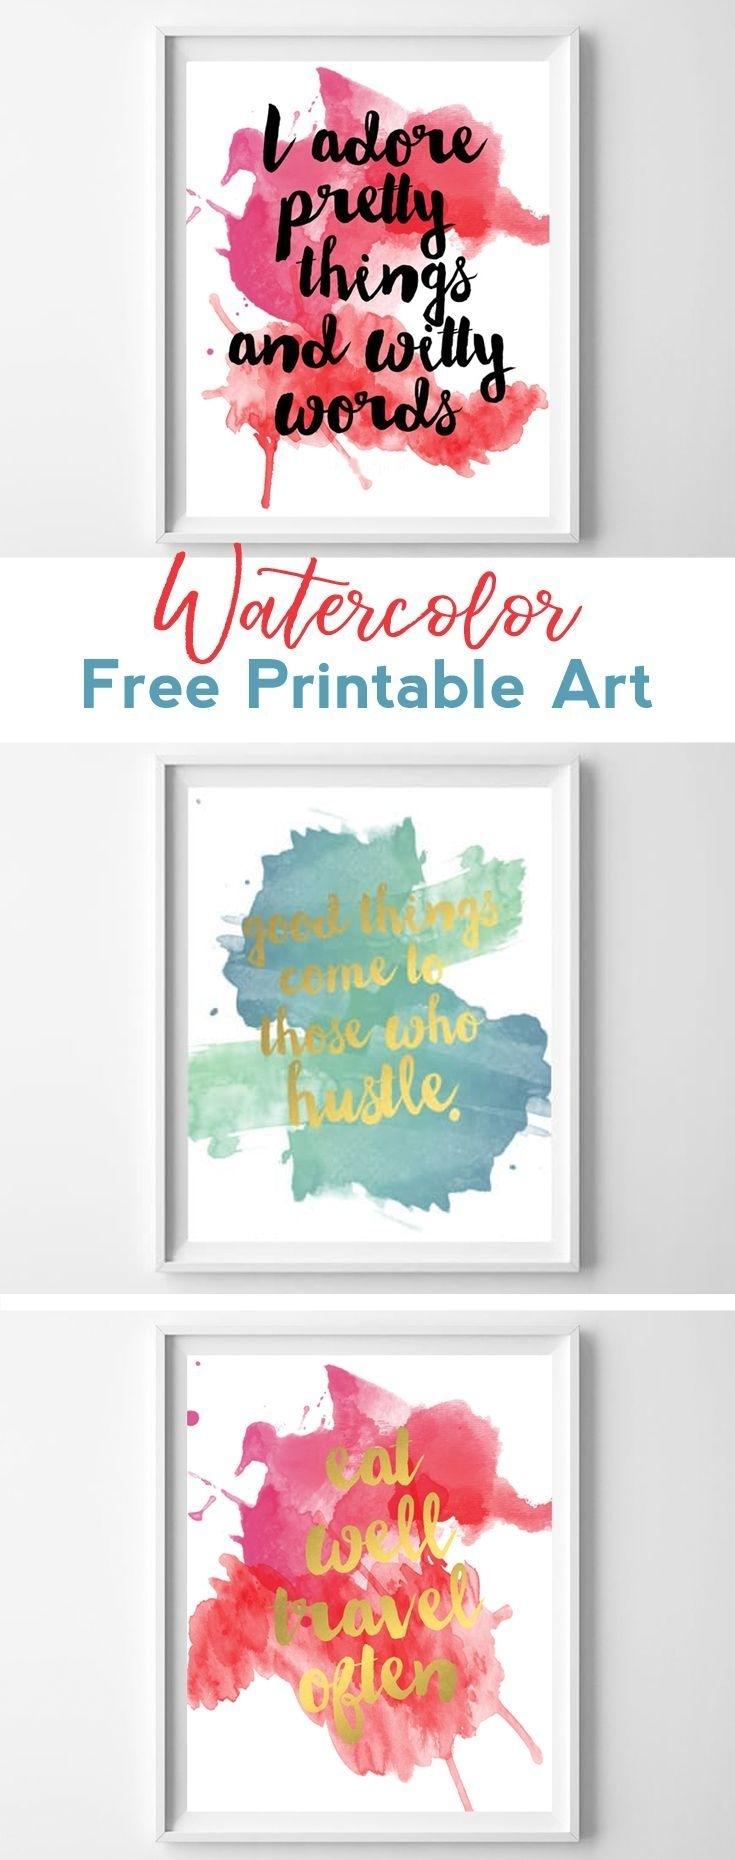 Watercolor Free Printables | Diy Crafts | Pinterest | Kate Spade Regarding Newest Kate Spade Wall Art (View 20 of 20)